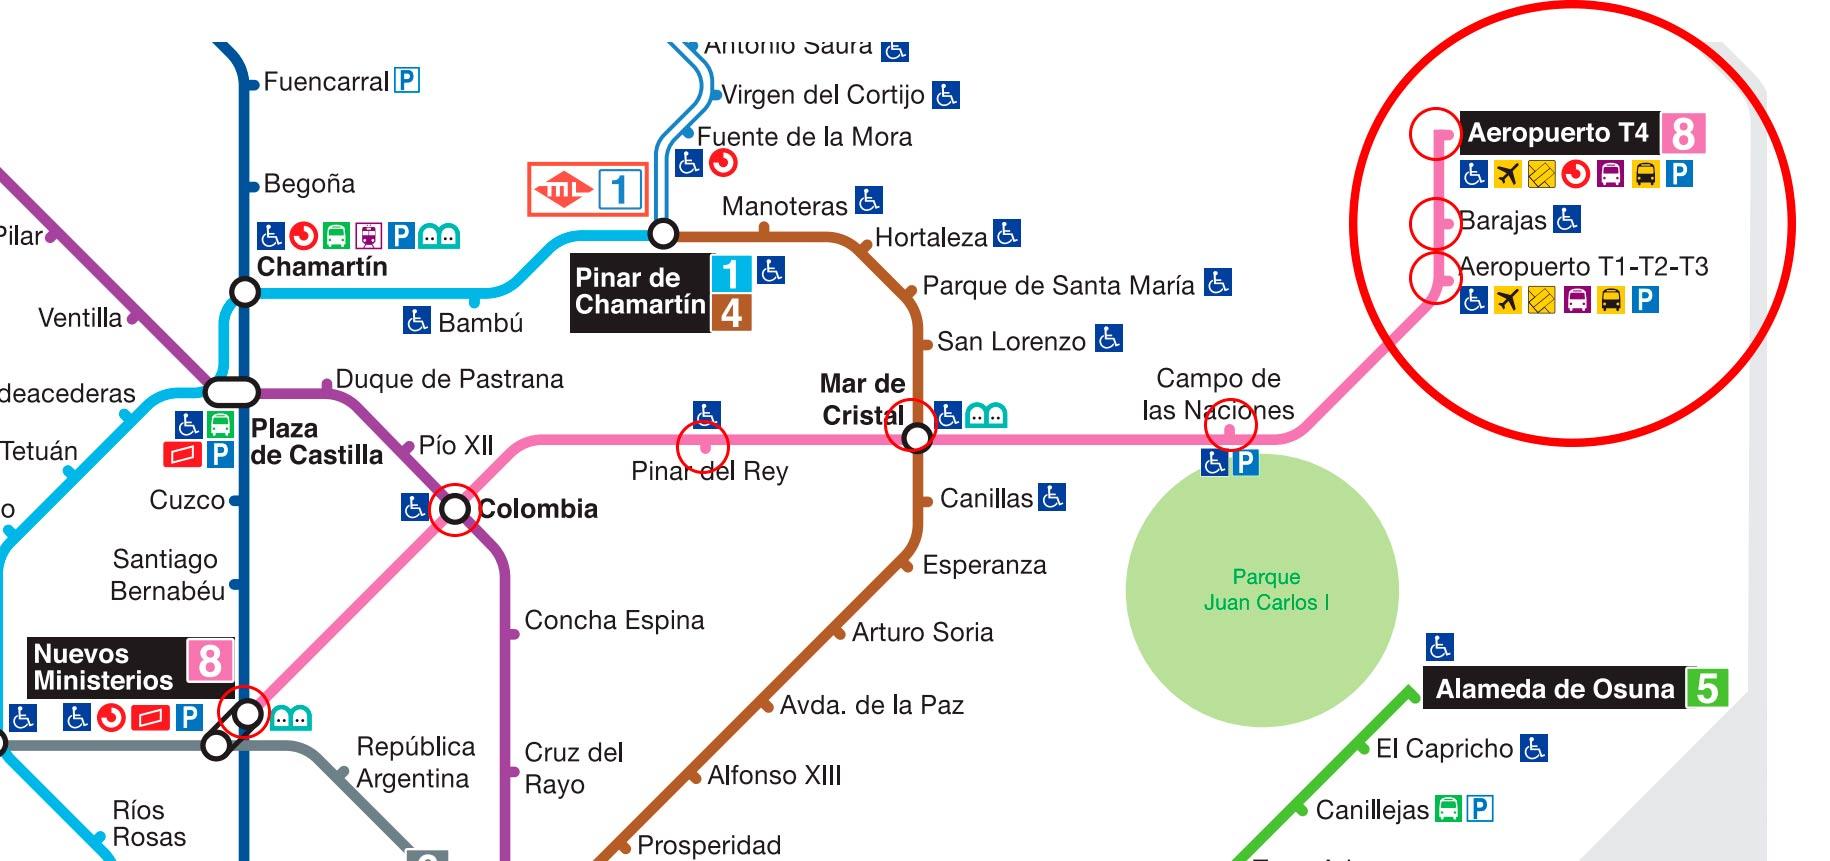 Как-добраться-до-аэропорта-Мадрида-метро